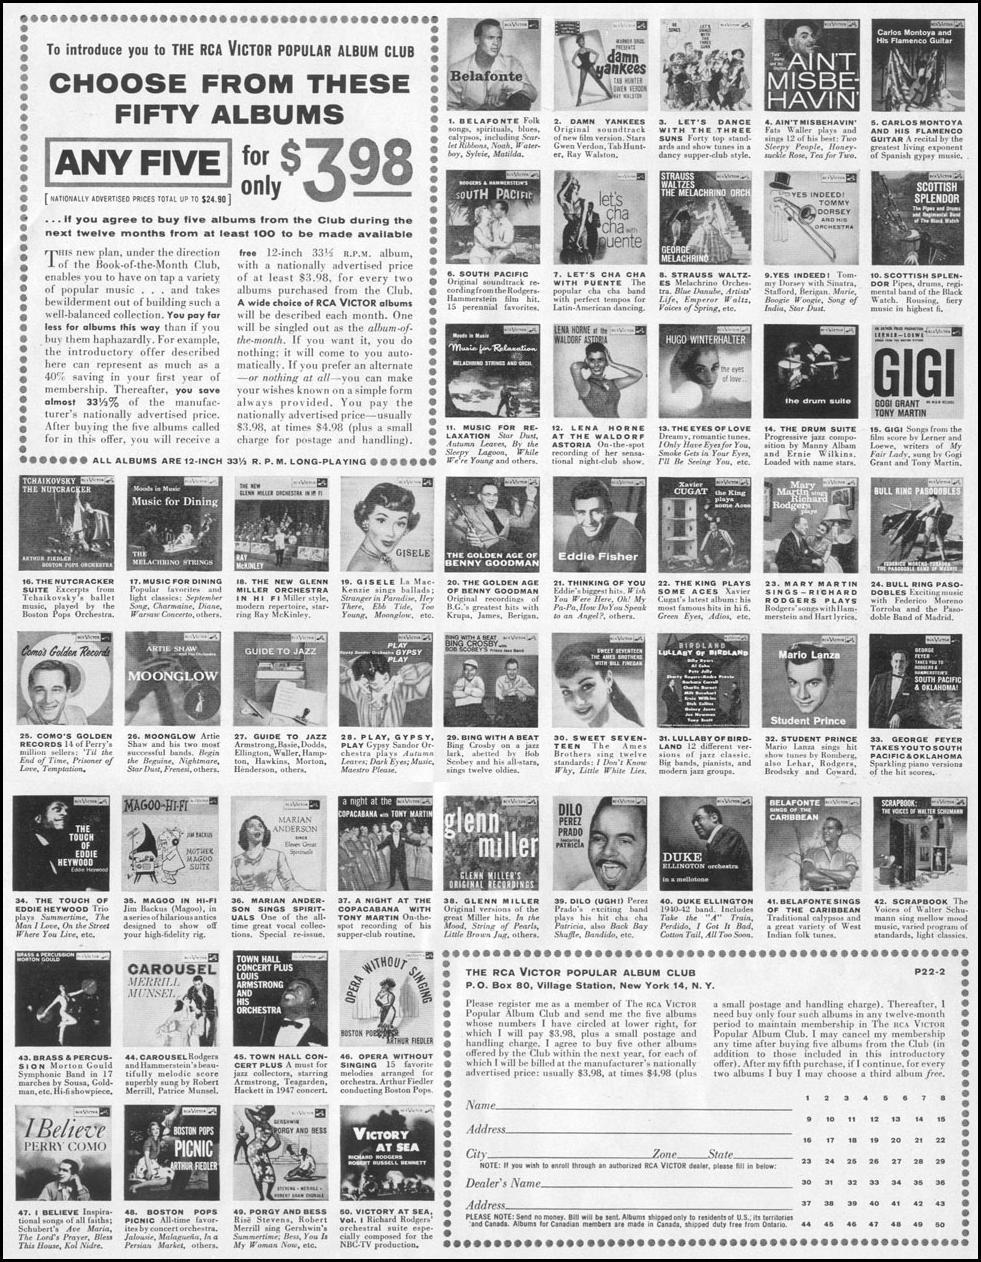 RCA VICTOR RECORD CLUB LIFE 02/09/1959 p. 11